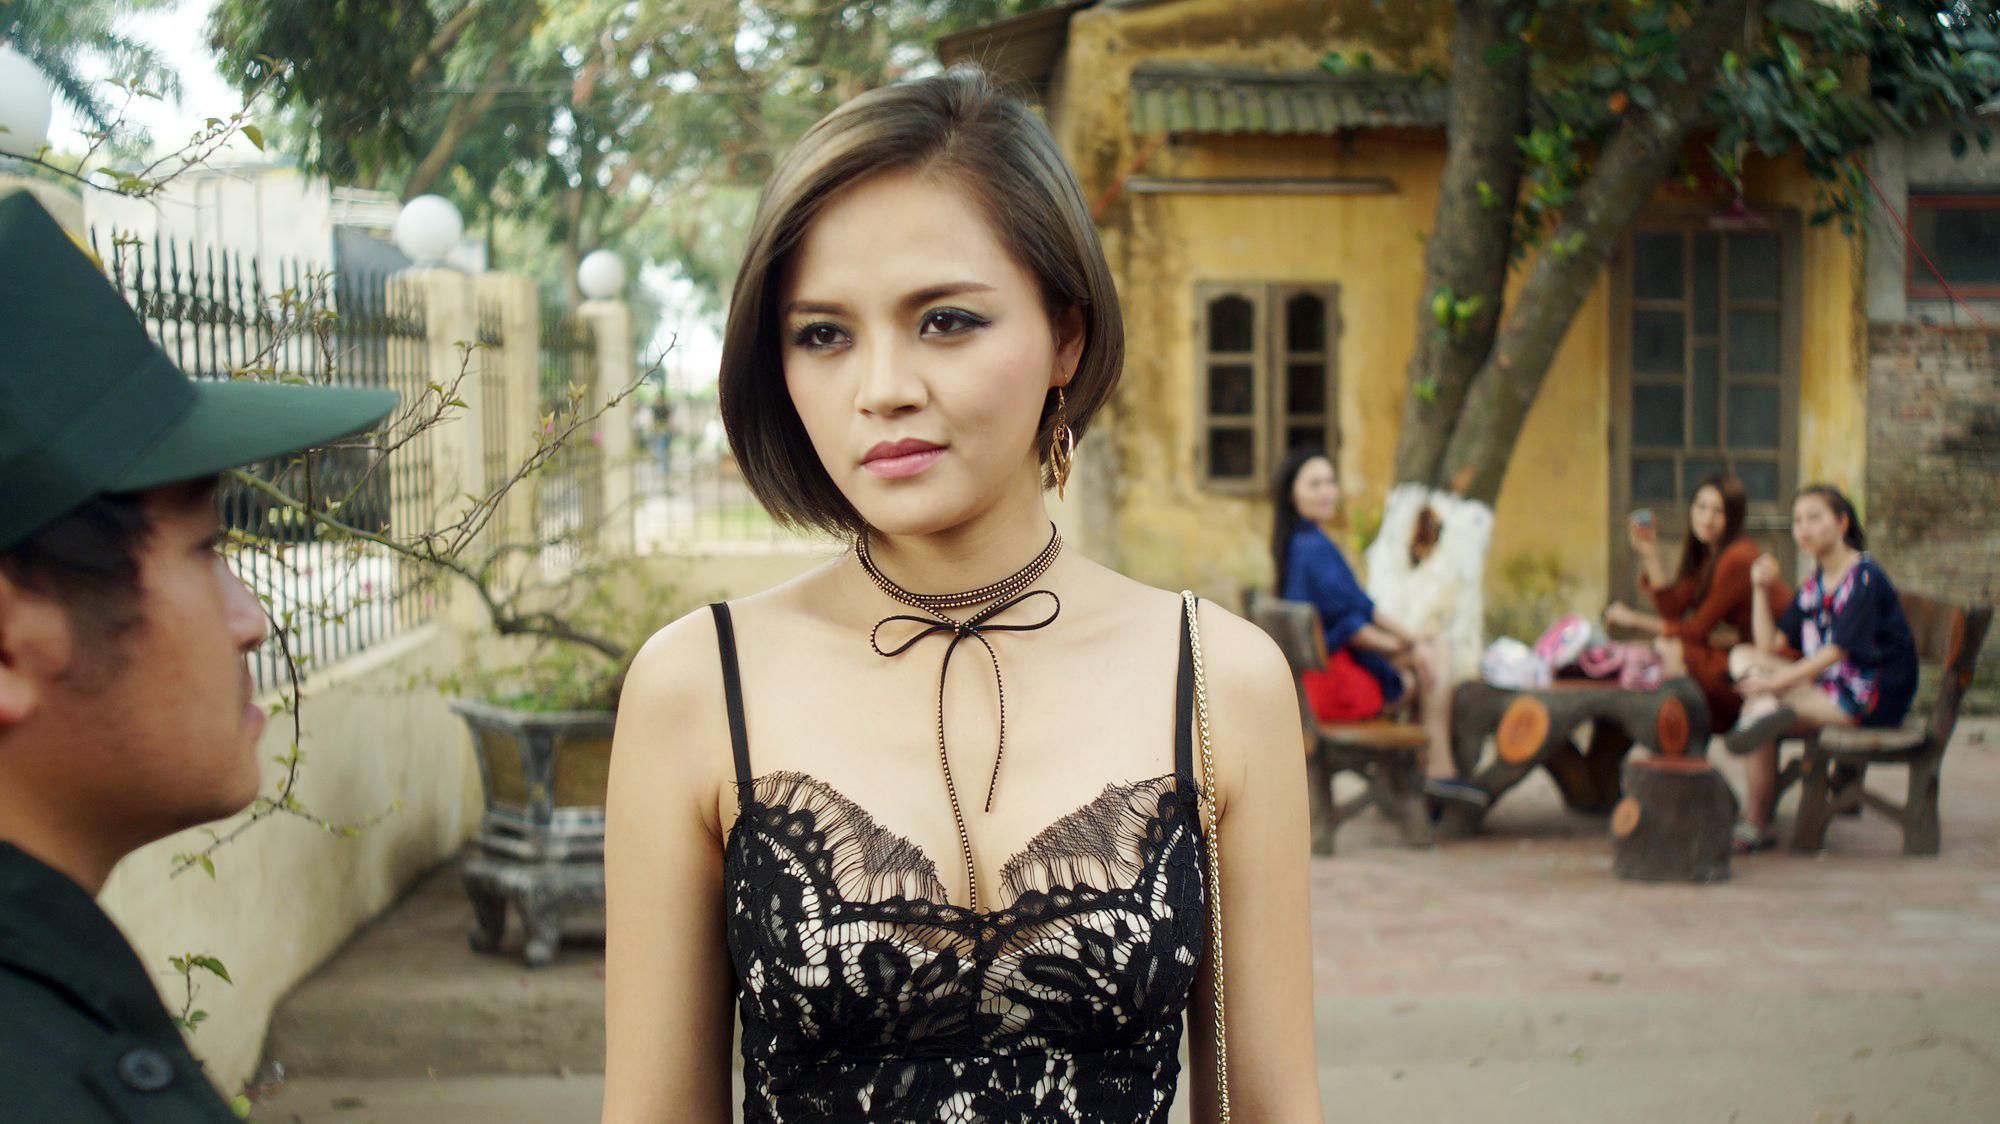 3. Thu Quỳnh - My